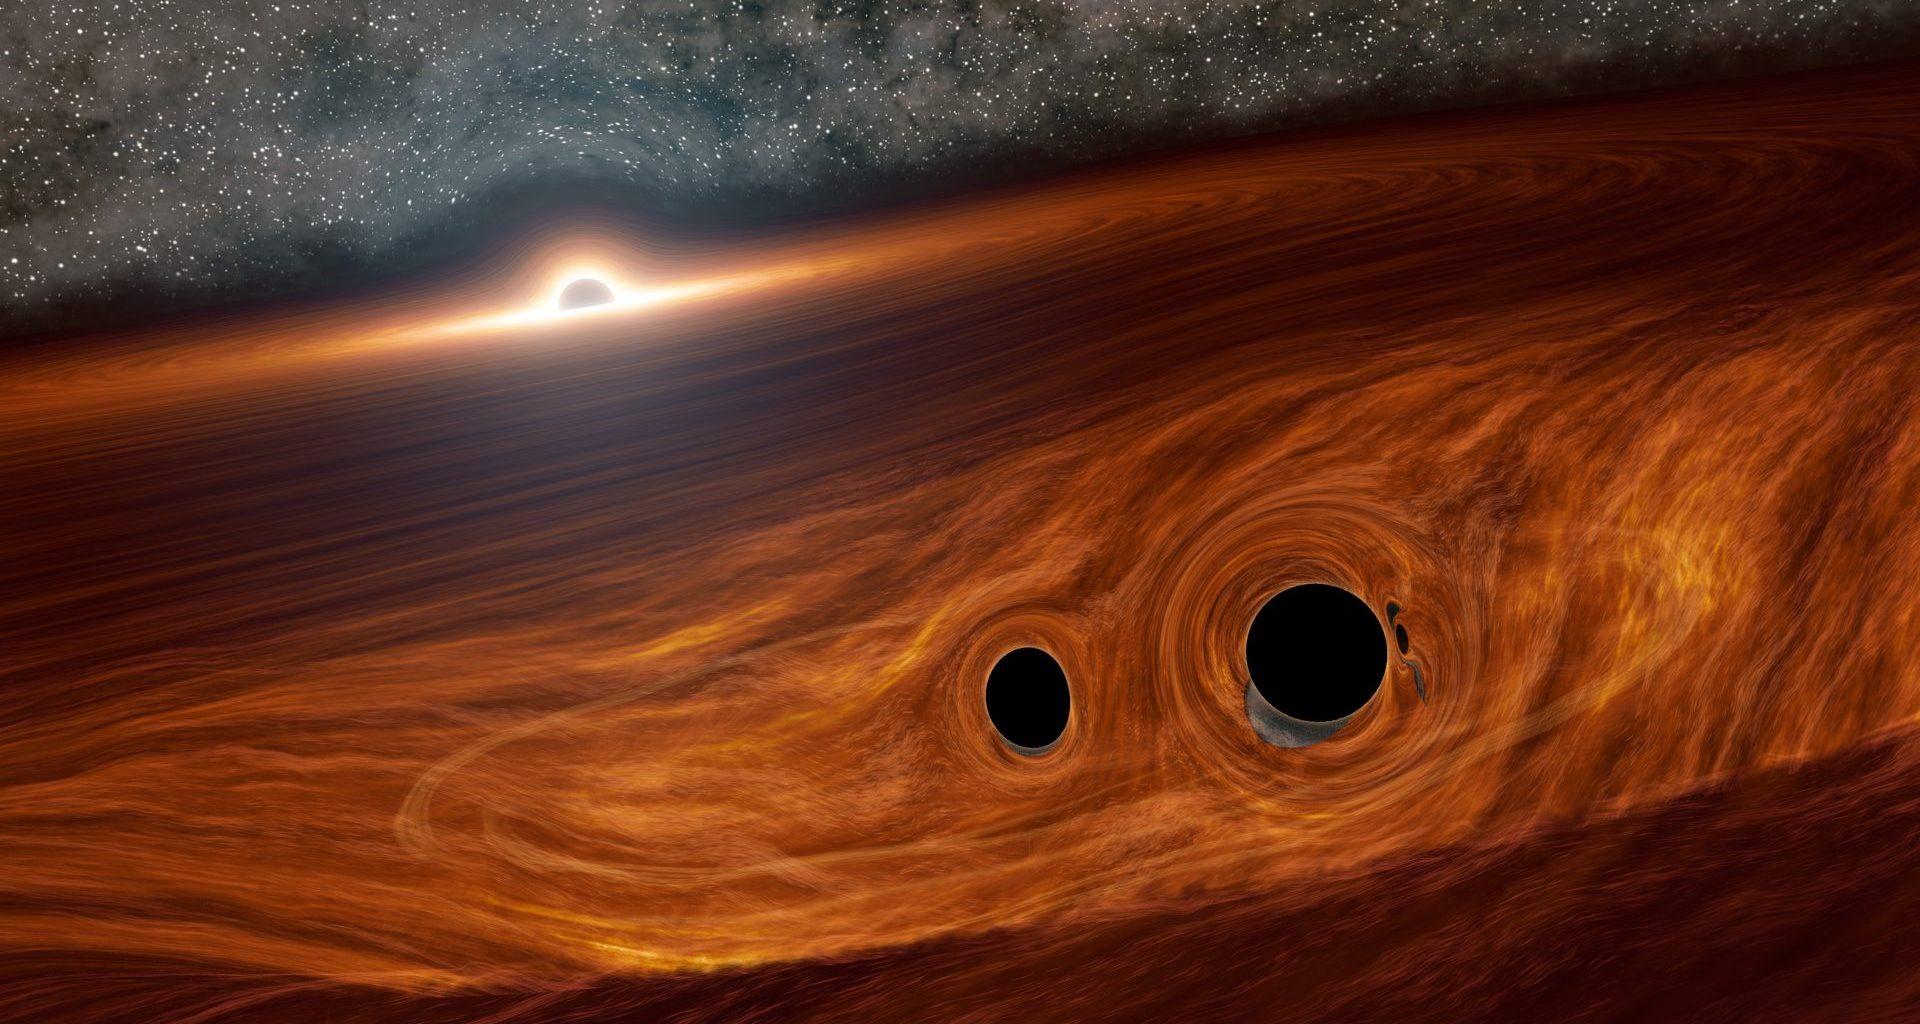 Astrónomos observan un raro evento de fusión de tres agujeros negros supermasivos